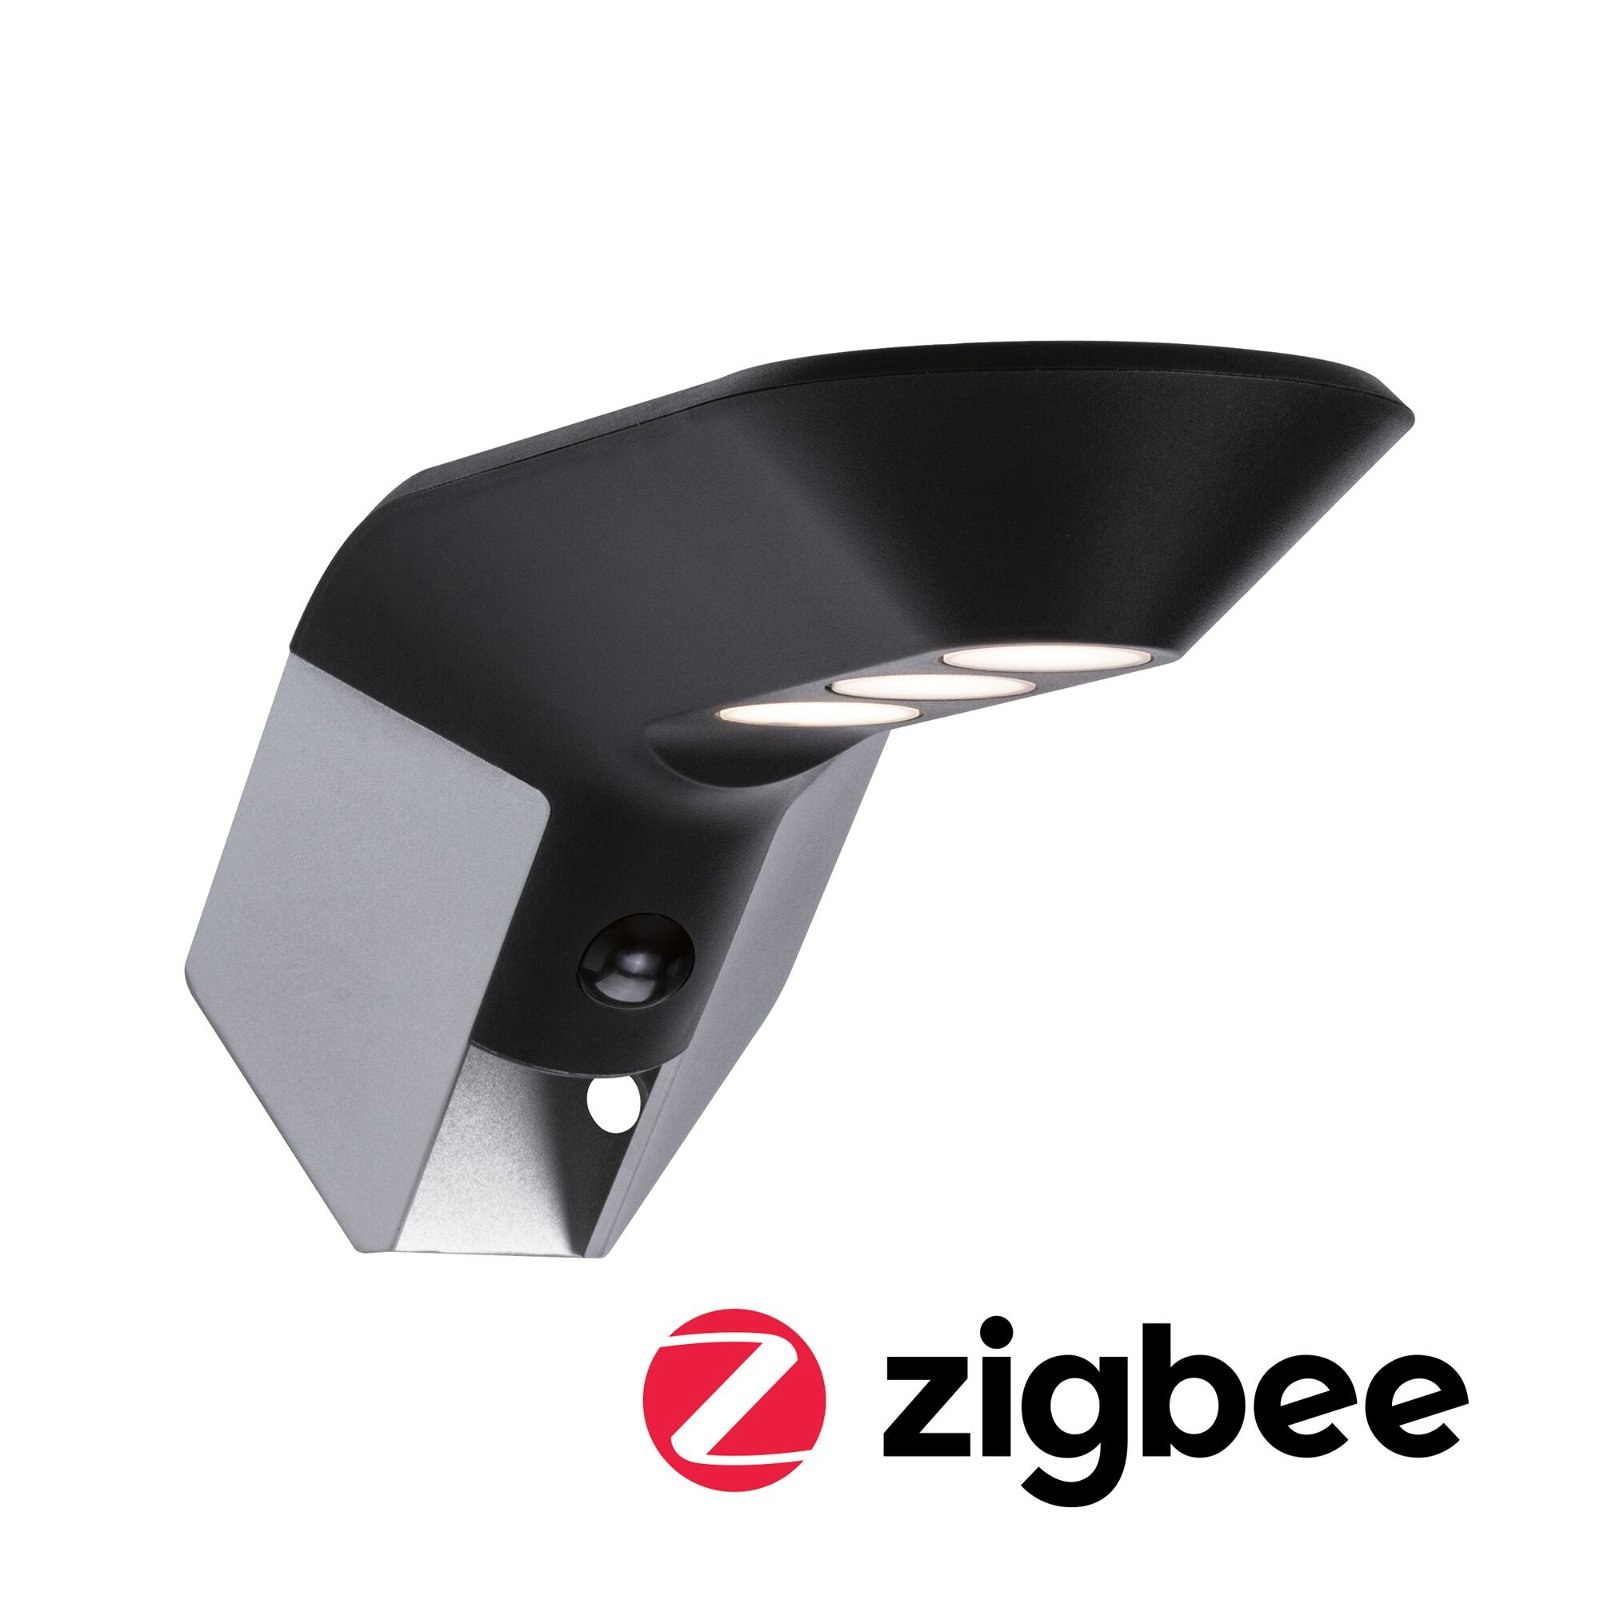 Solar LED Hausnummernleuchte Smart Home Zigbee Soley Bewegungsmelder IP44 3000K 115lm Anthrazit